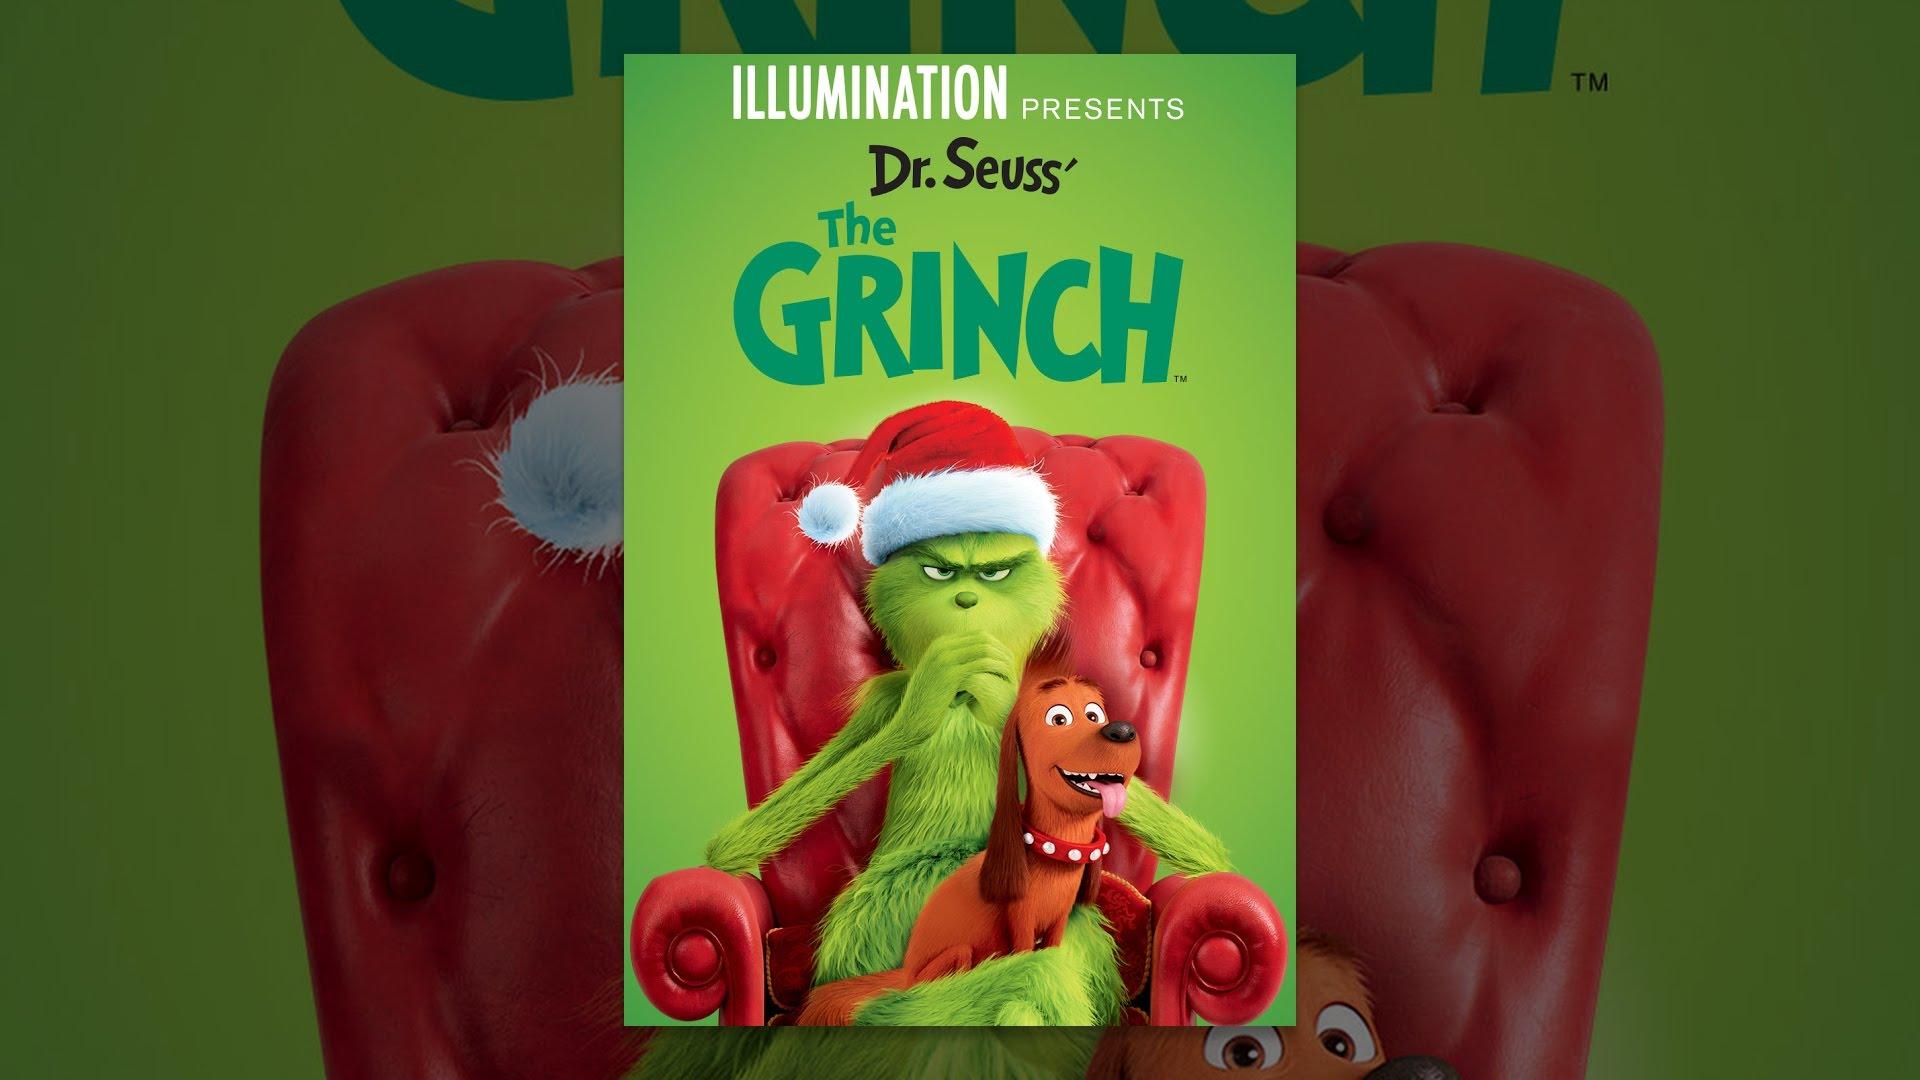 illumination-presents-dr-seuss-the-grinch